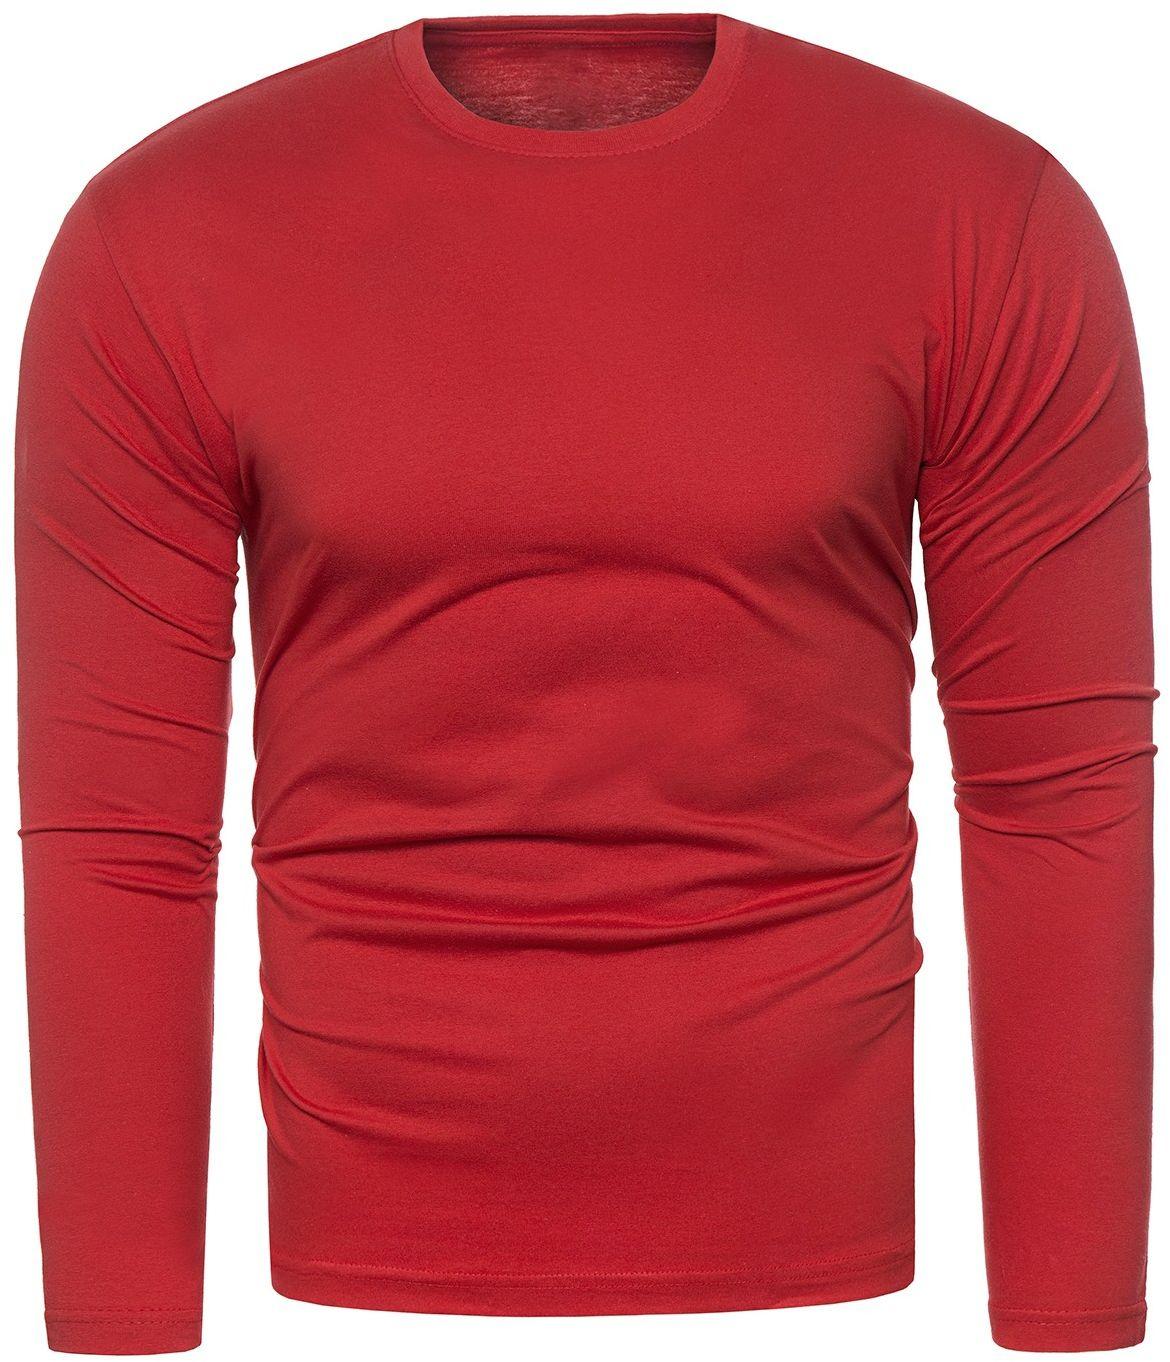 Bluza męska longsleeve N01L - czerwona